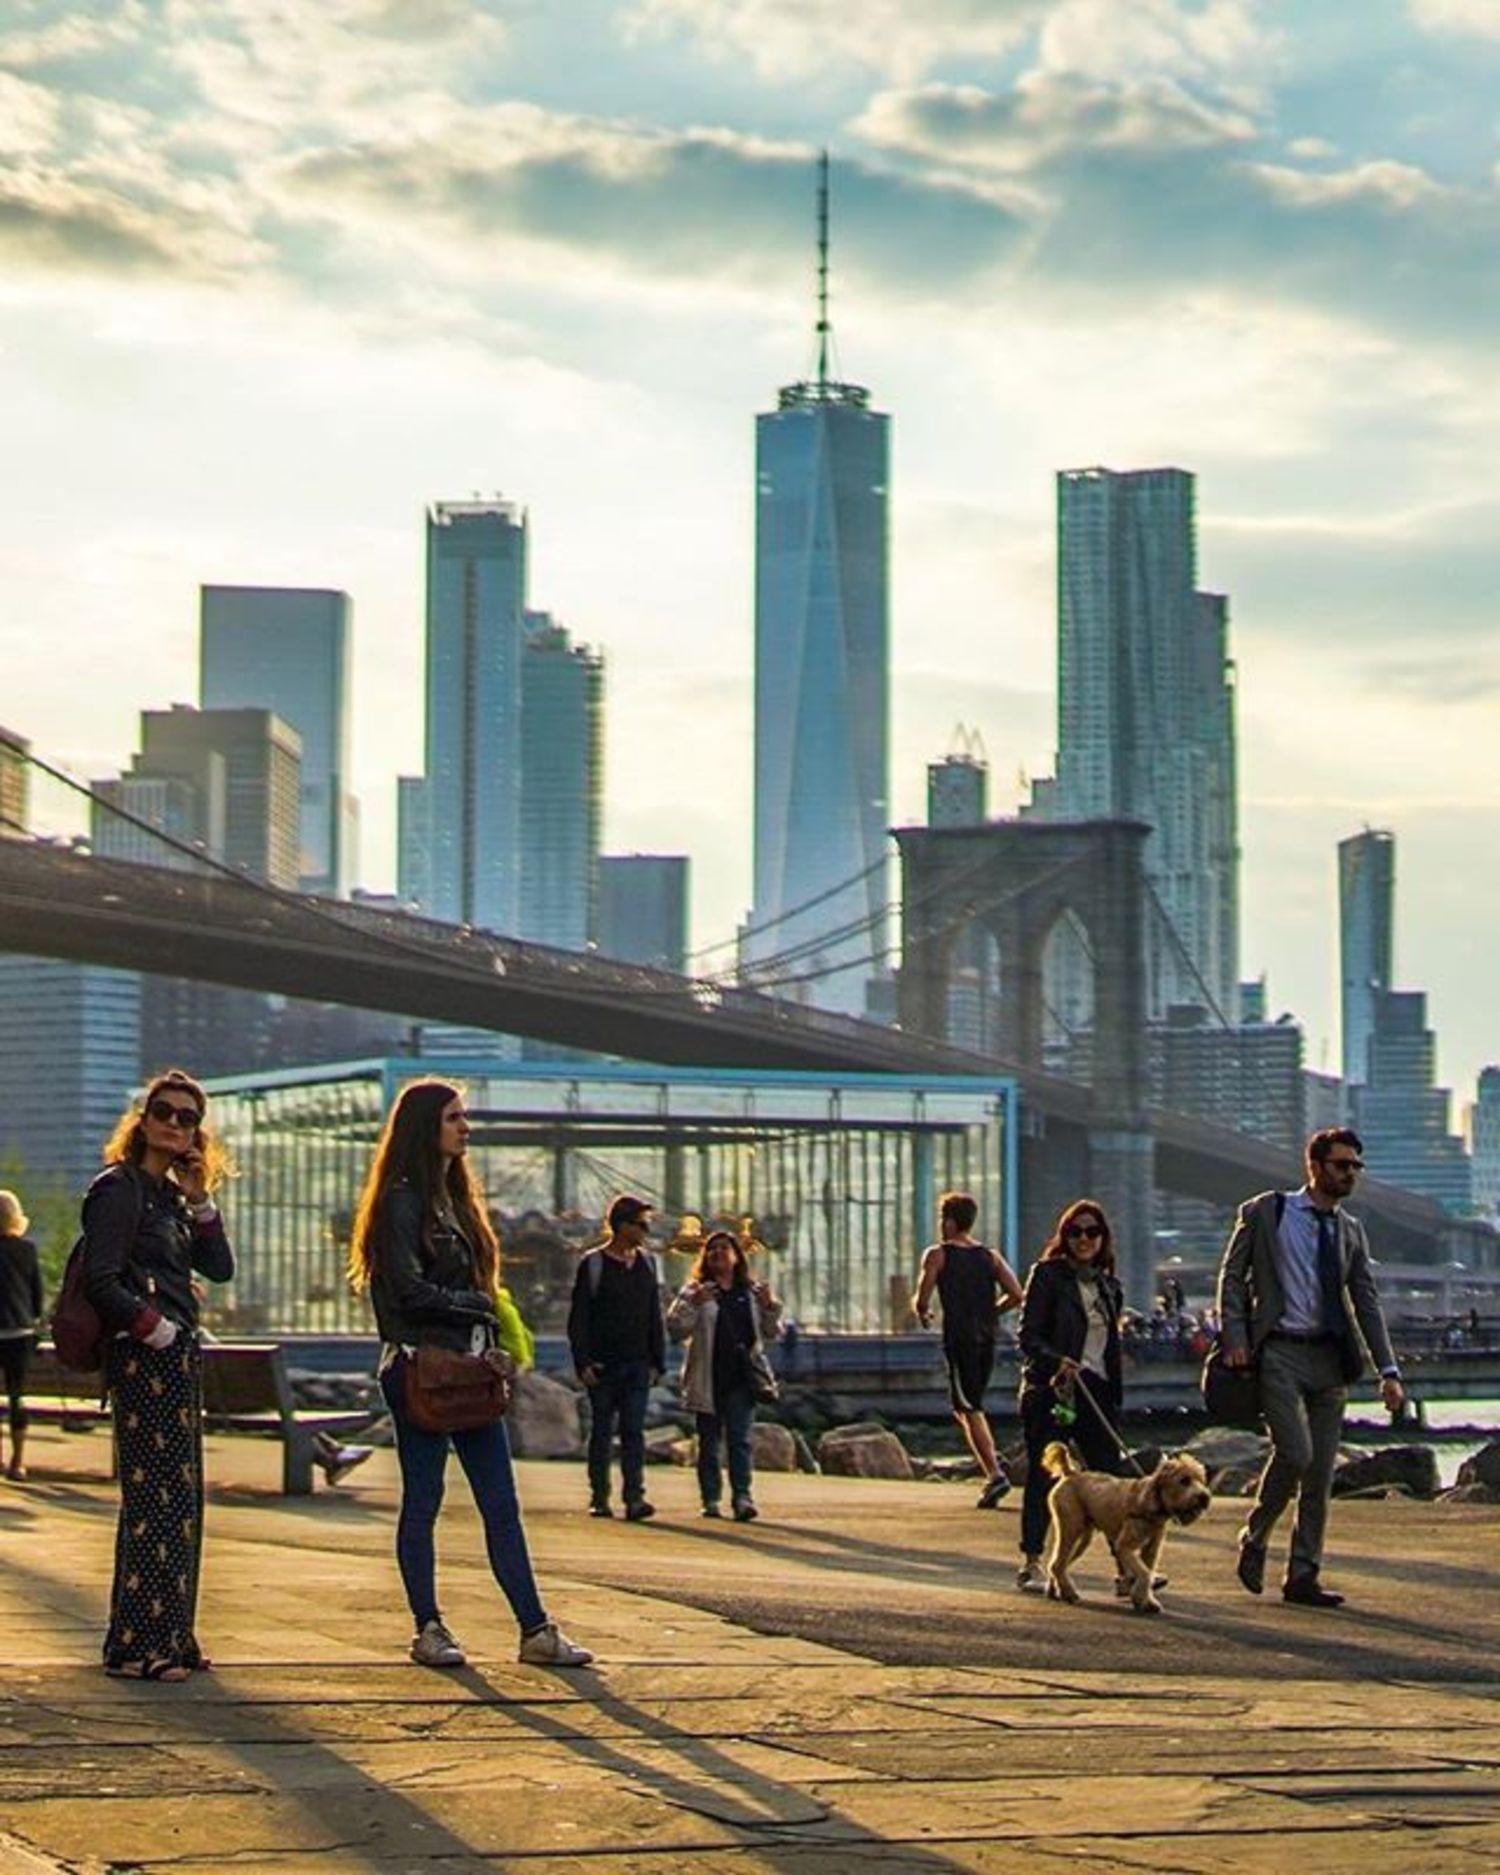 Dumbo, Brooklyn. Photo via @ctg125 #viewingnyc #newyorkcity #newyork #nyc #dumbo #brooklyn #brooklynbridge #janescarousel